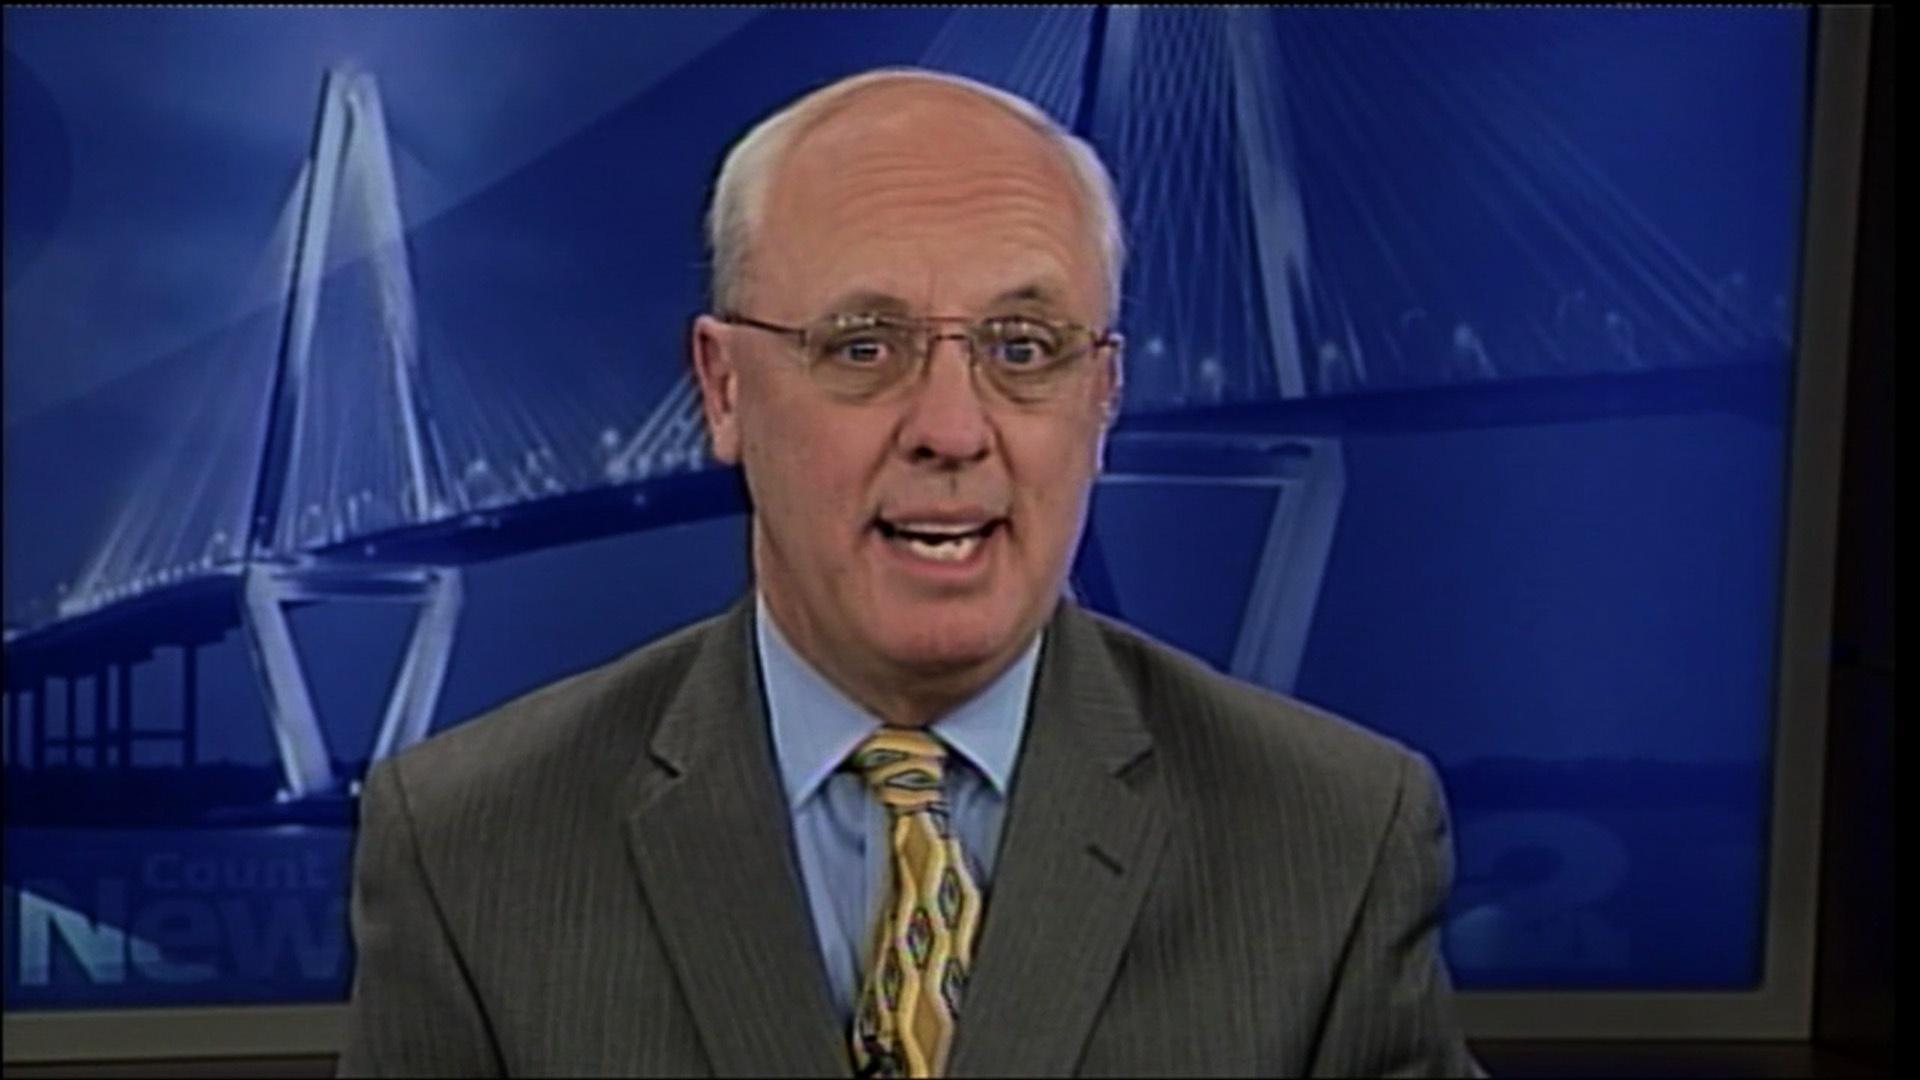 Indiana University SPEA Dean John D. Graham image